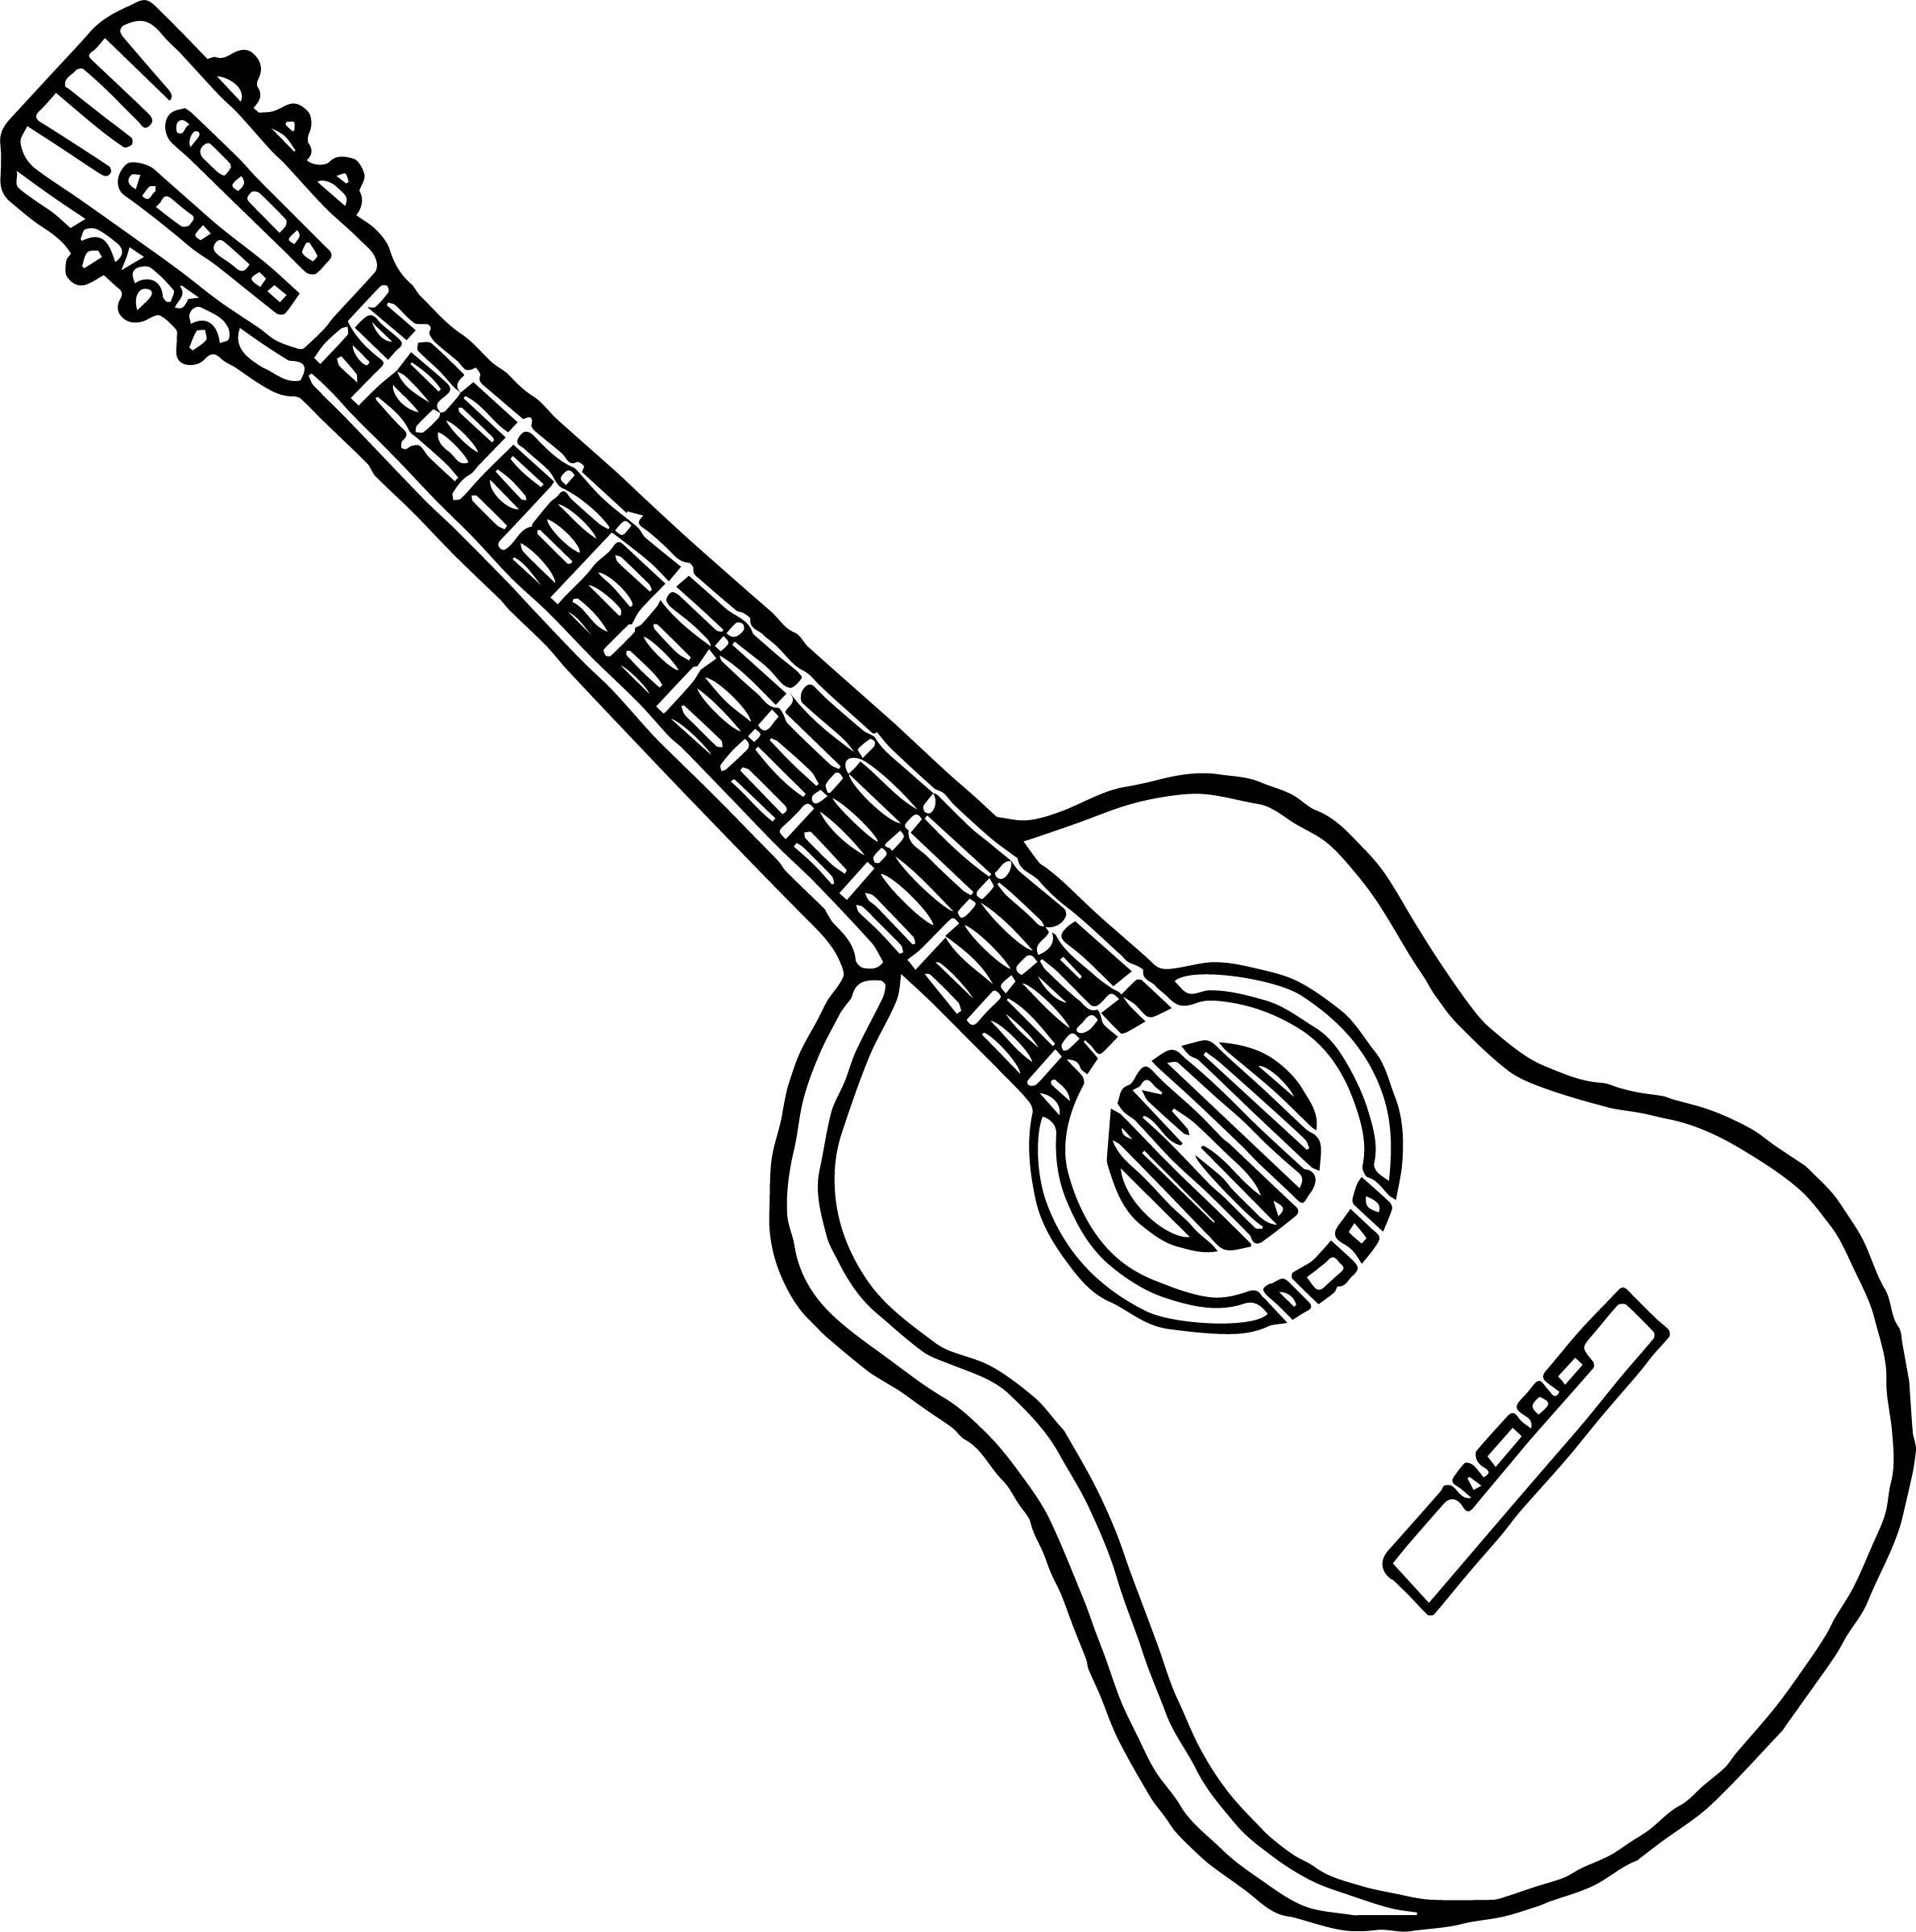 Electric Guitar Line Drawing At Getdrawings